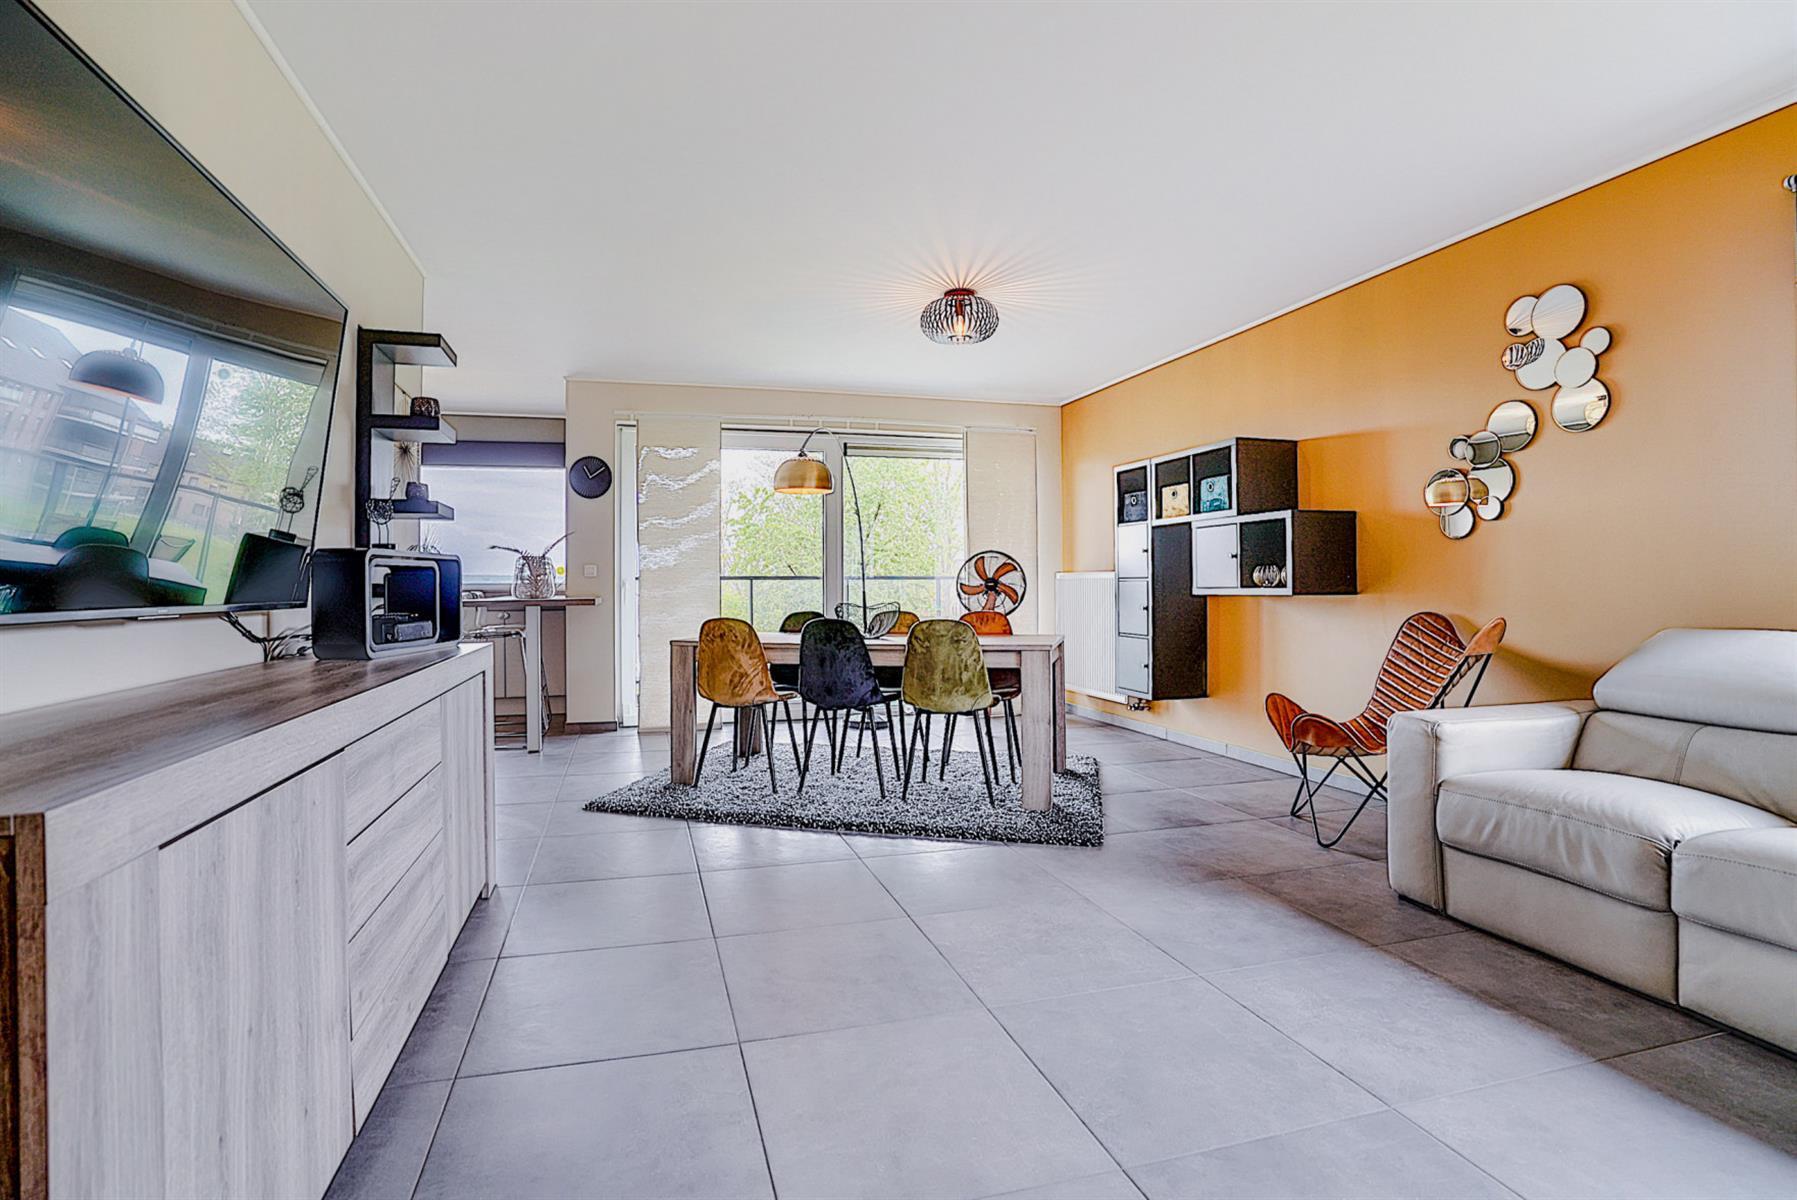 Appartement - Grâce-hollogne - #4364483-1